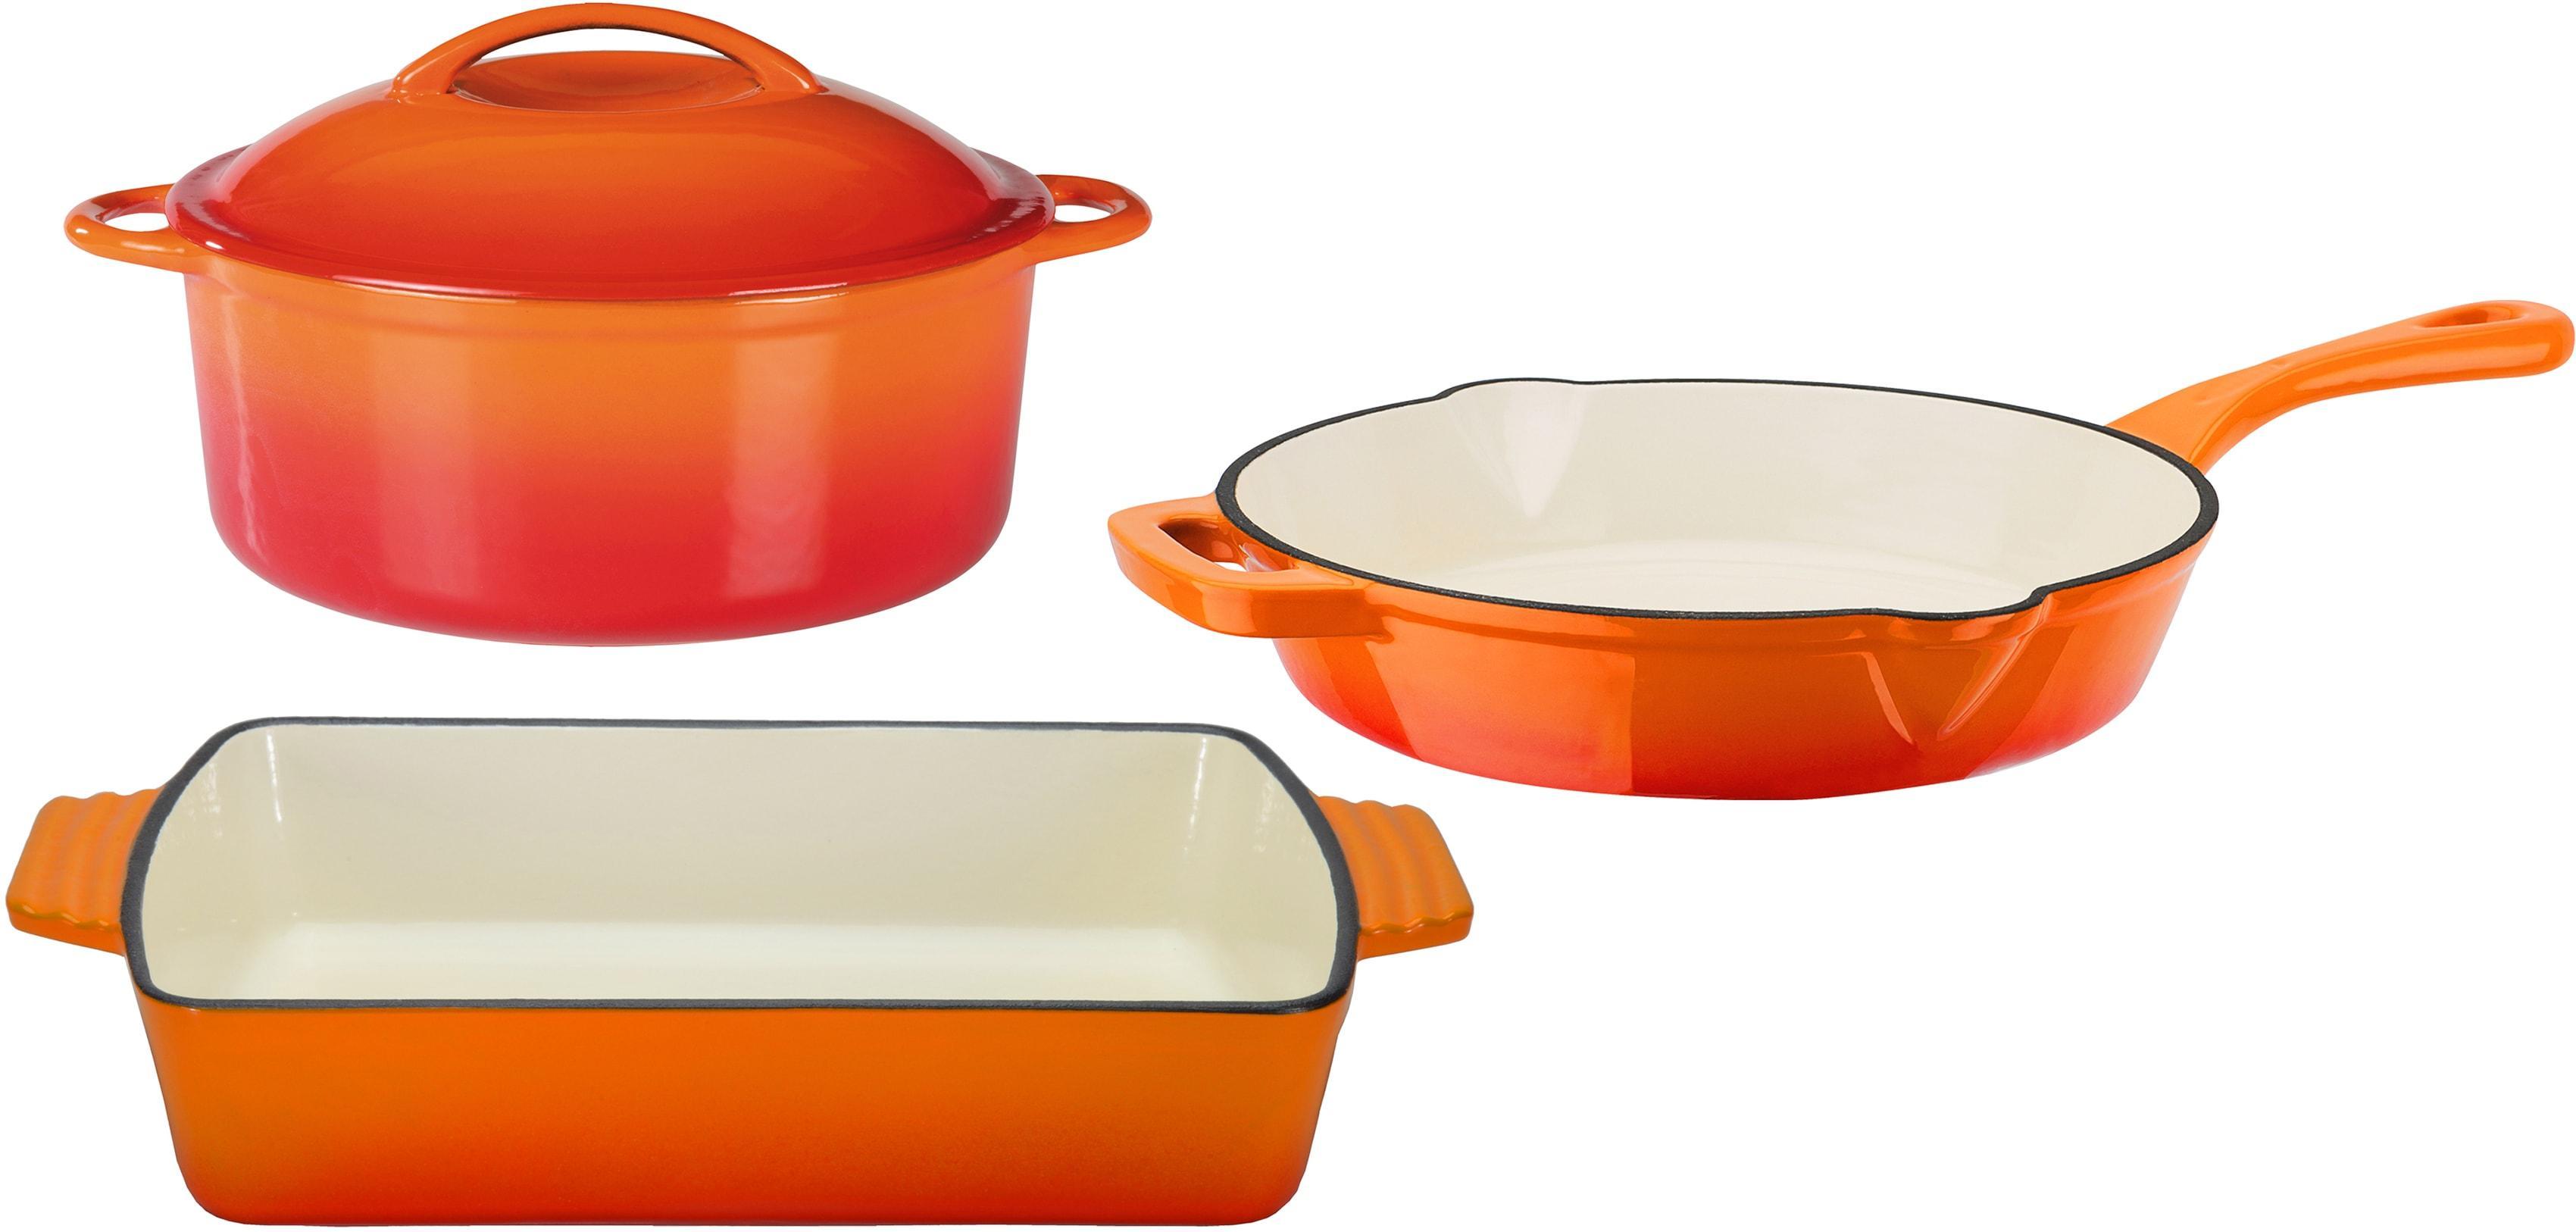 GSW Topf-Set Orange Shadow, Gusseisen, (Set, 4 tlg.), Induktion orange Topfsets Töpfe Haushaltswaren